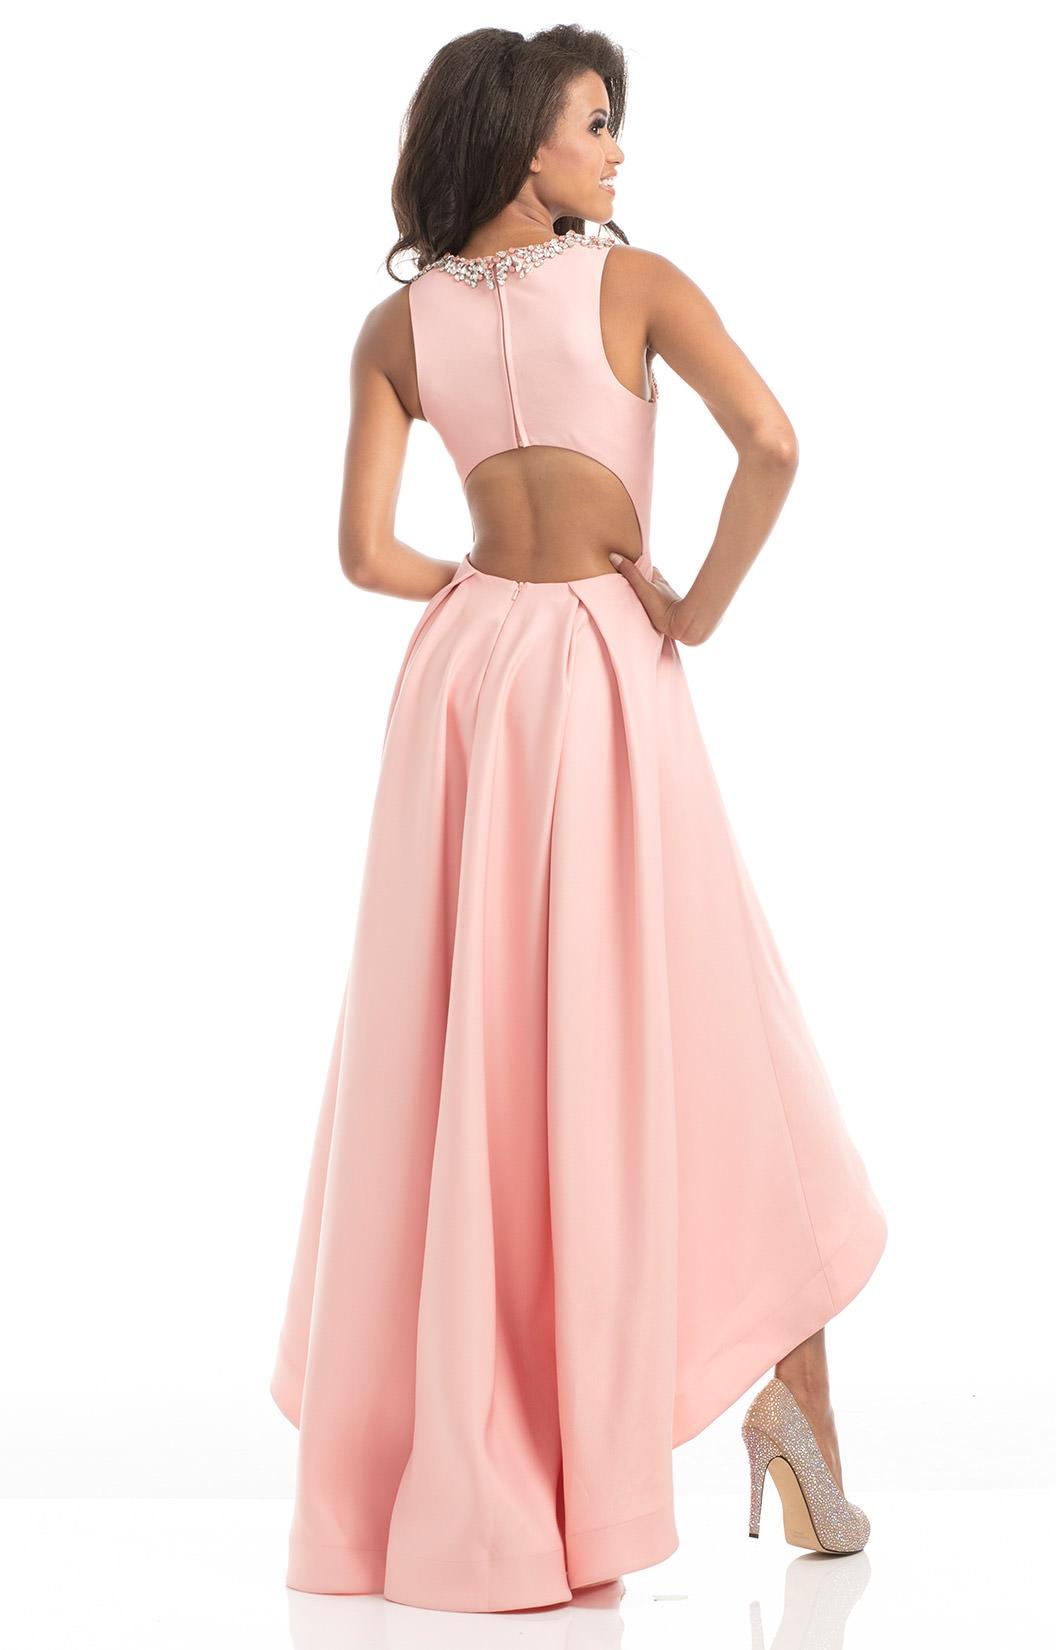 Johnathan Kayne 7004 - Low to High Sleaveless Open Back dress Prom Dress